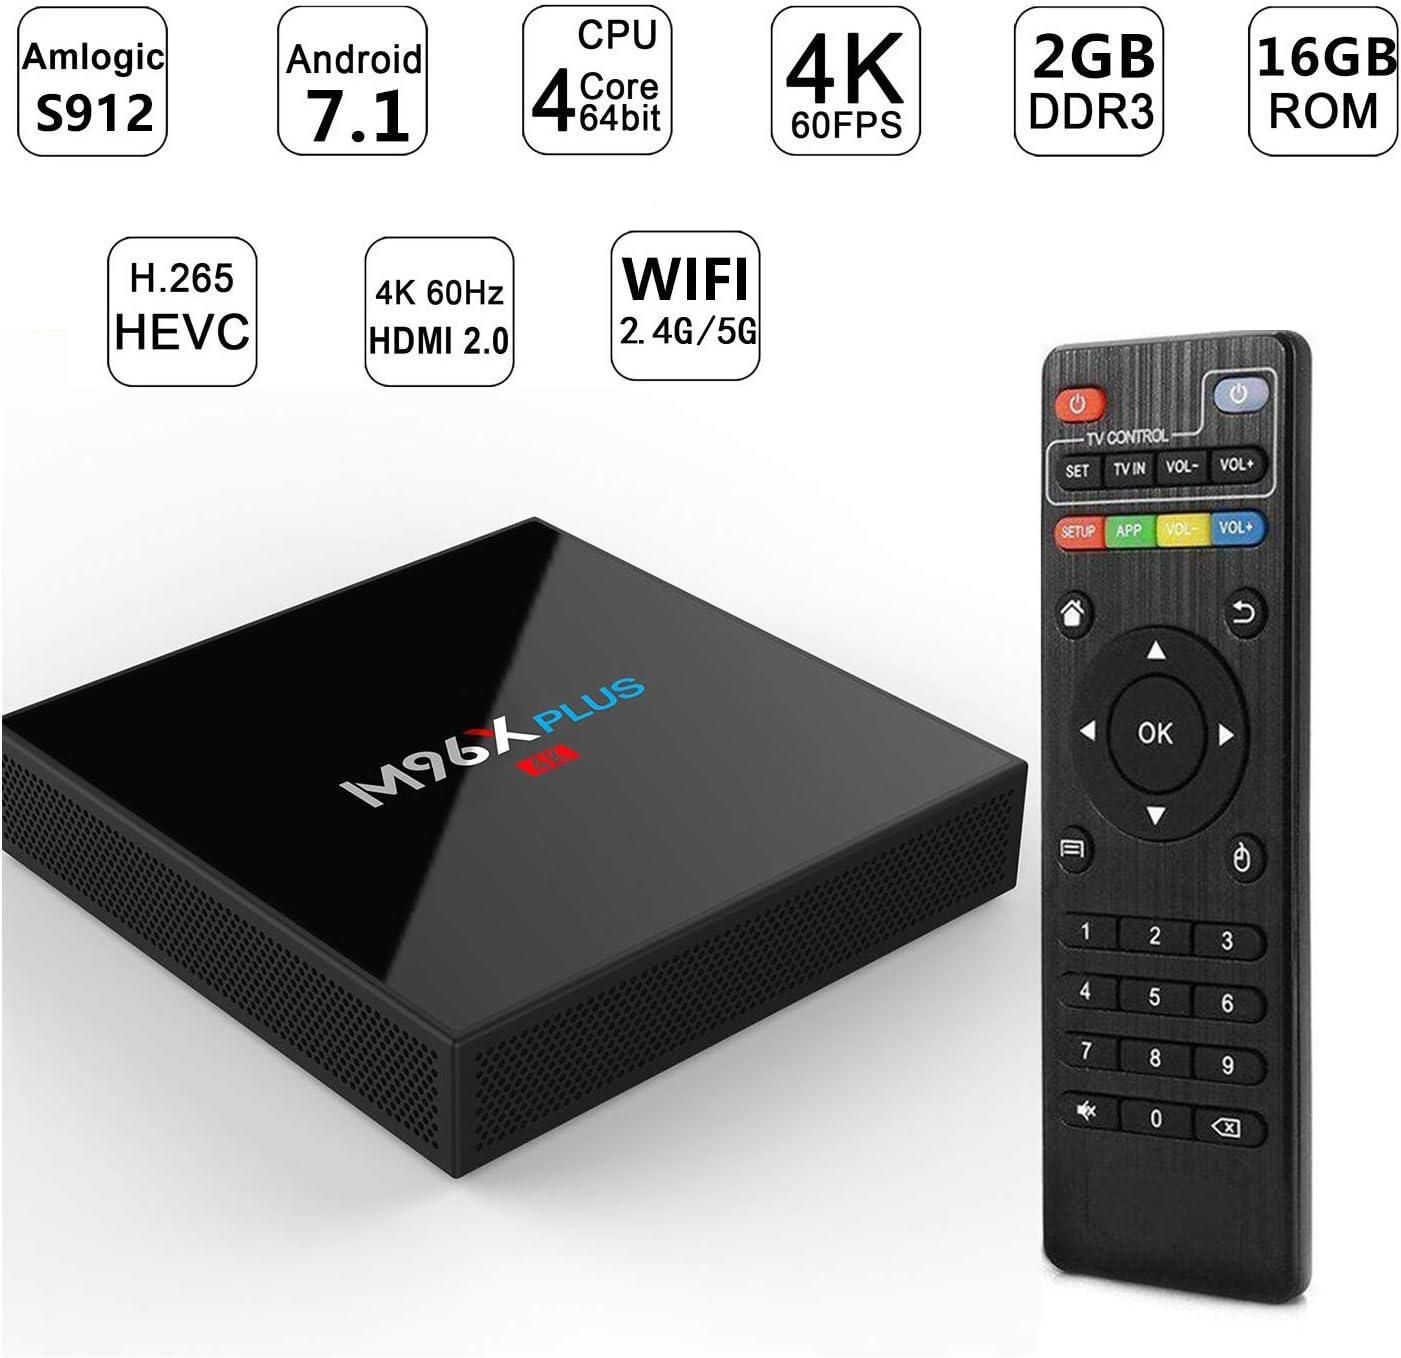 WXJHA Smart TV Box Amlogic S912 2 GB de RAM 16 GB de ROM Set Top Box Android 7.1 Soporte HDMI 2.1 / H265 VP9 decodificación de vídeo/Dual WiFi 2.4G /5.0G Box